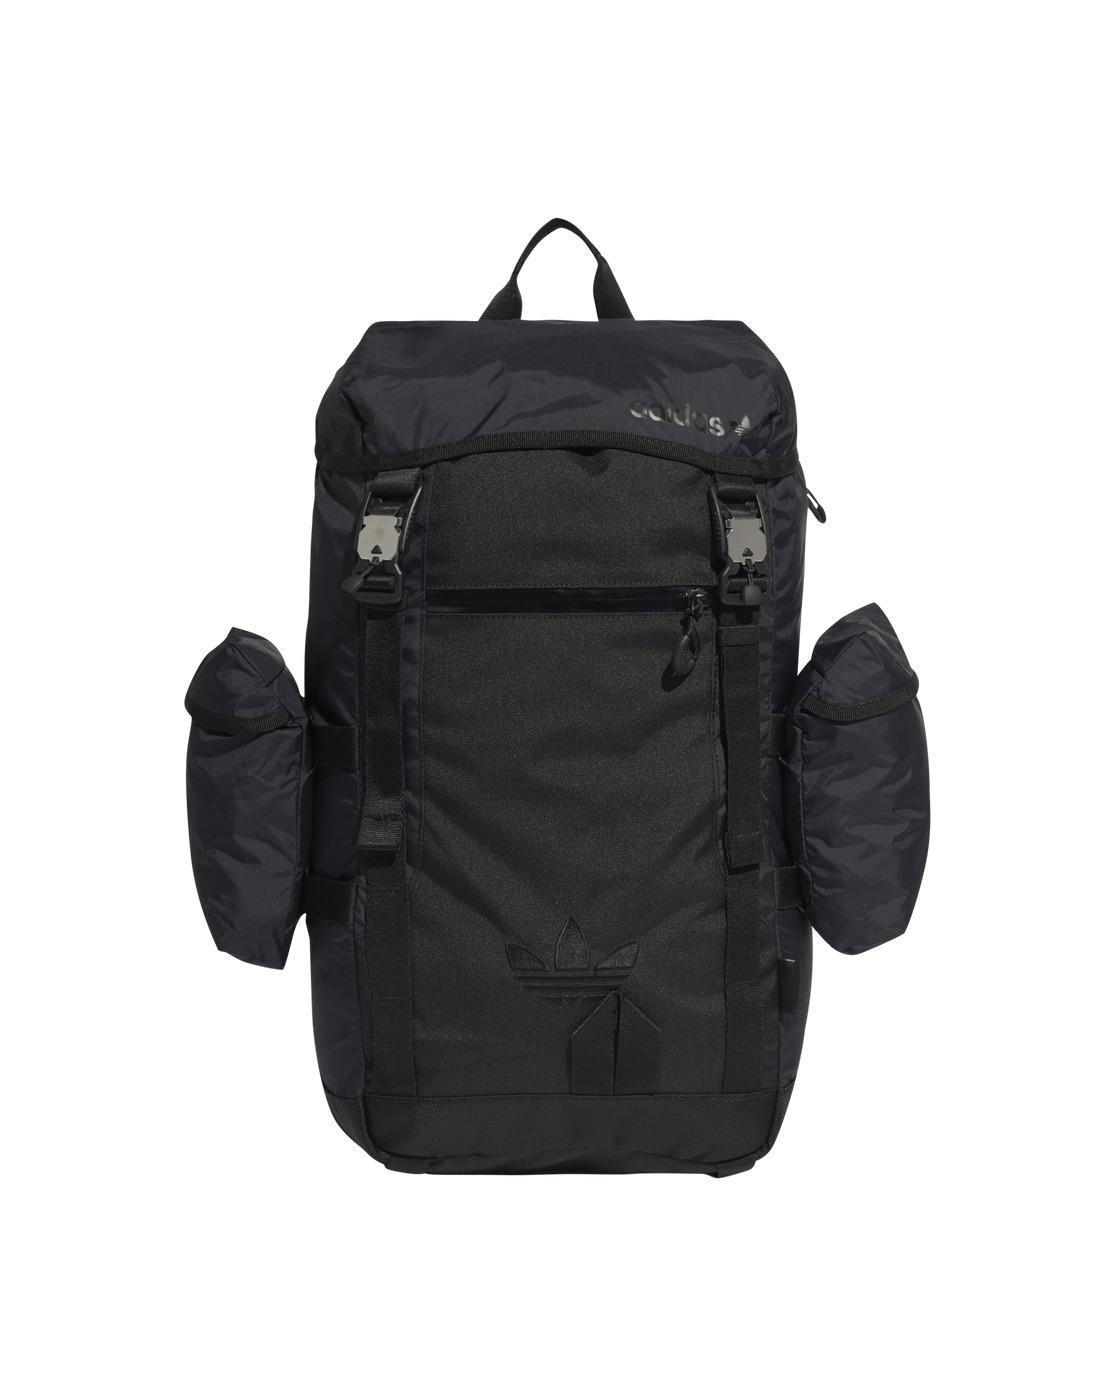 Adidas Originals Adventure Toploader Backpack Black